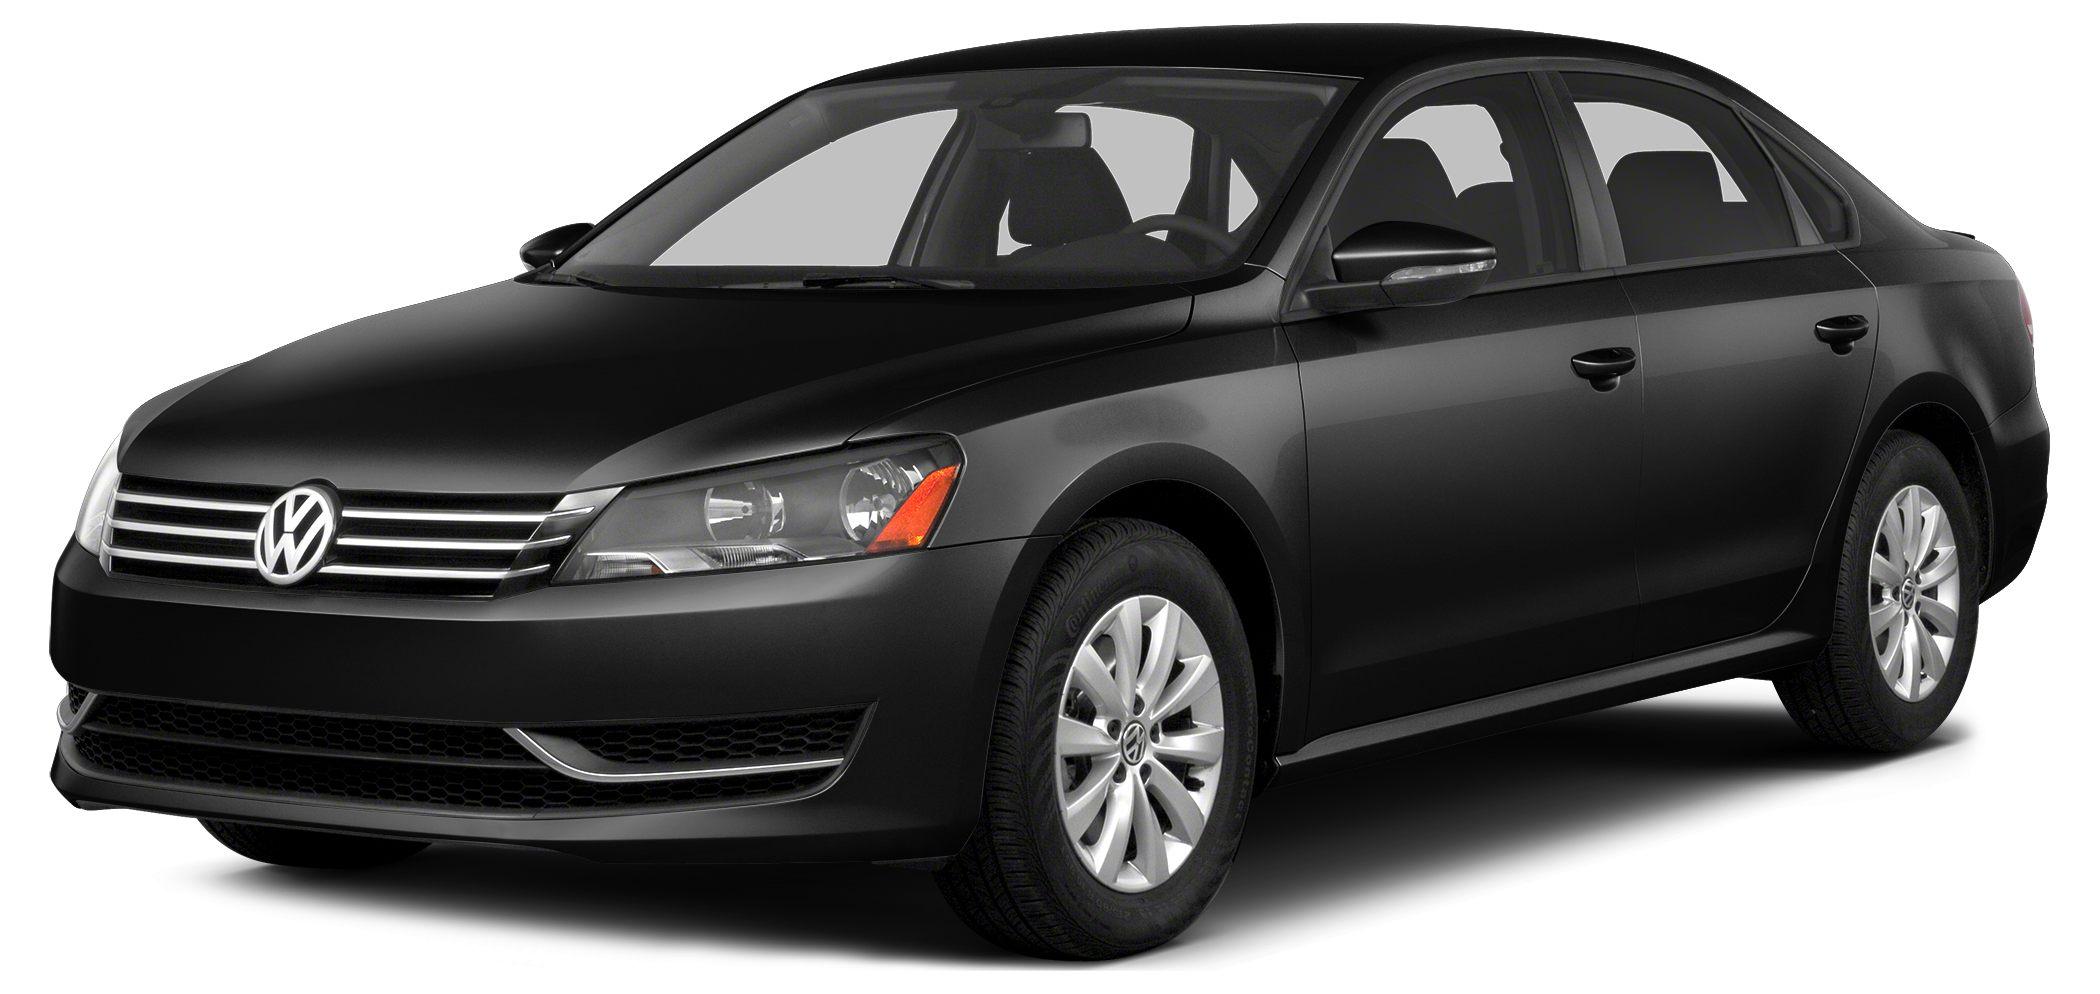 2014 Volkswagen Passat 18T SEL Premium Miles 55736Color Black Stock SB16538A VIN 1VWCT7A3XE